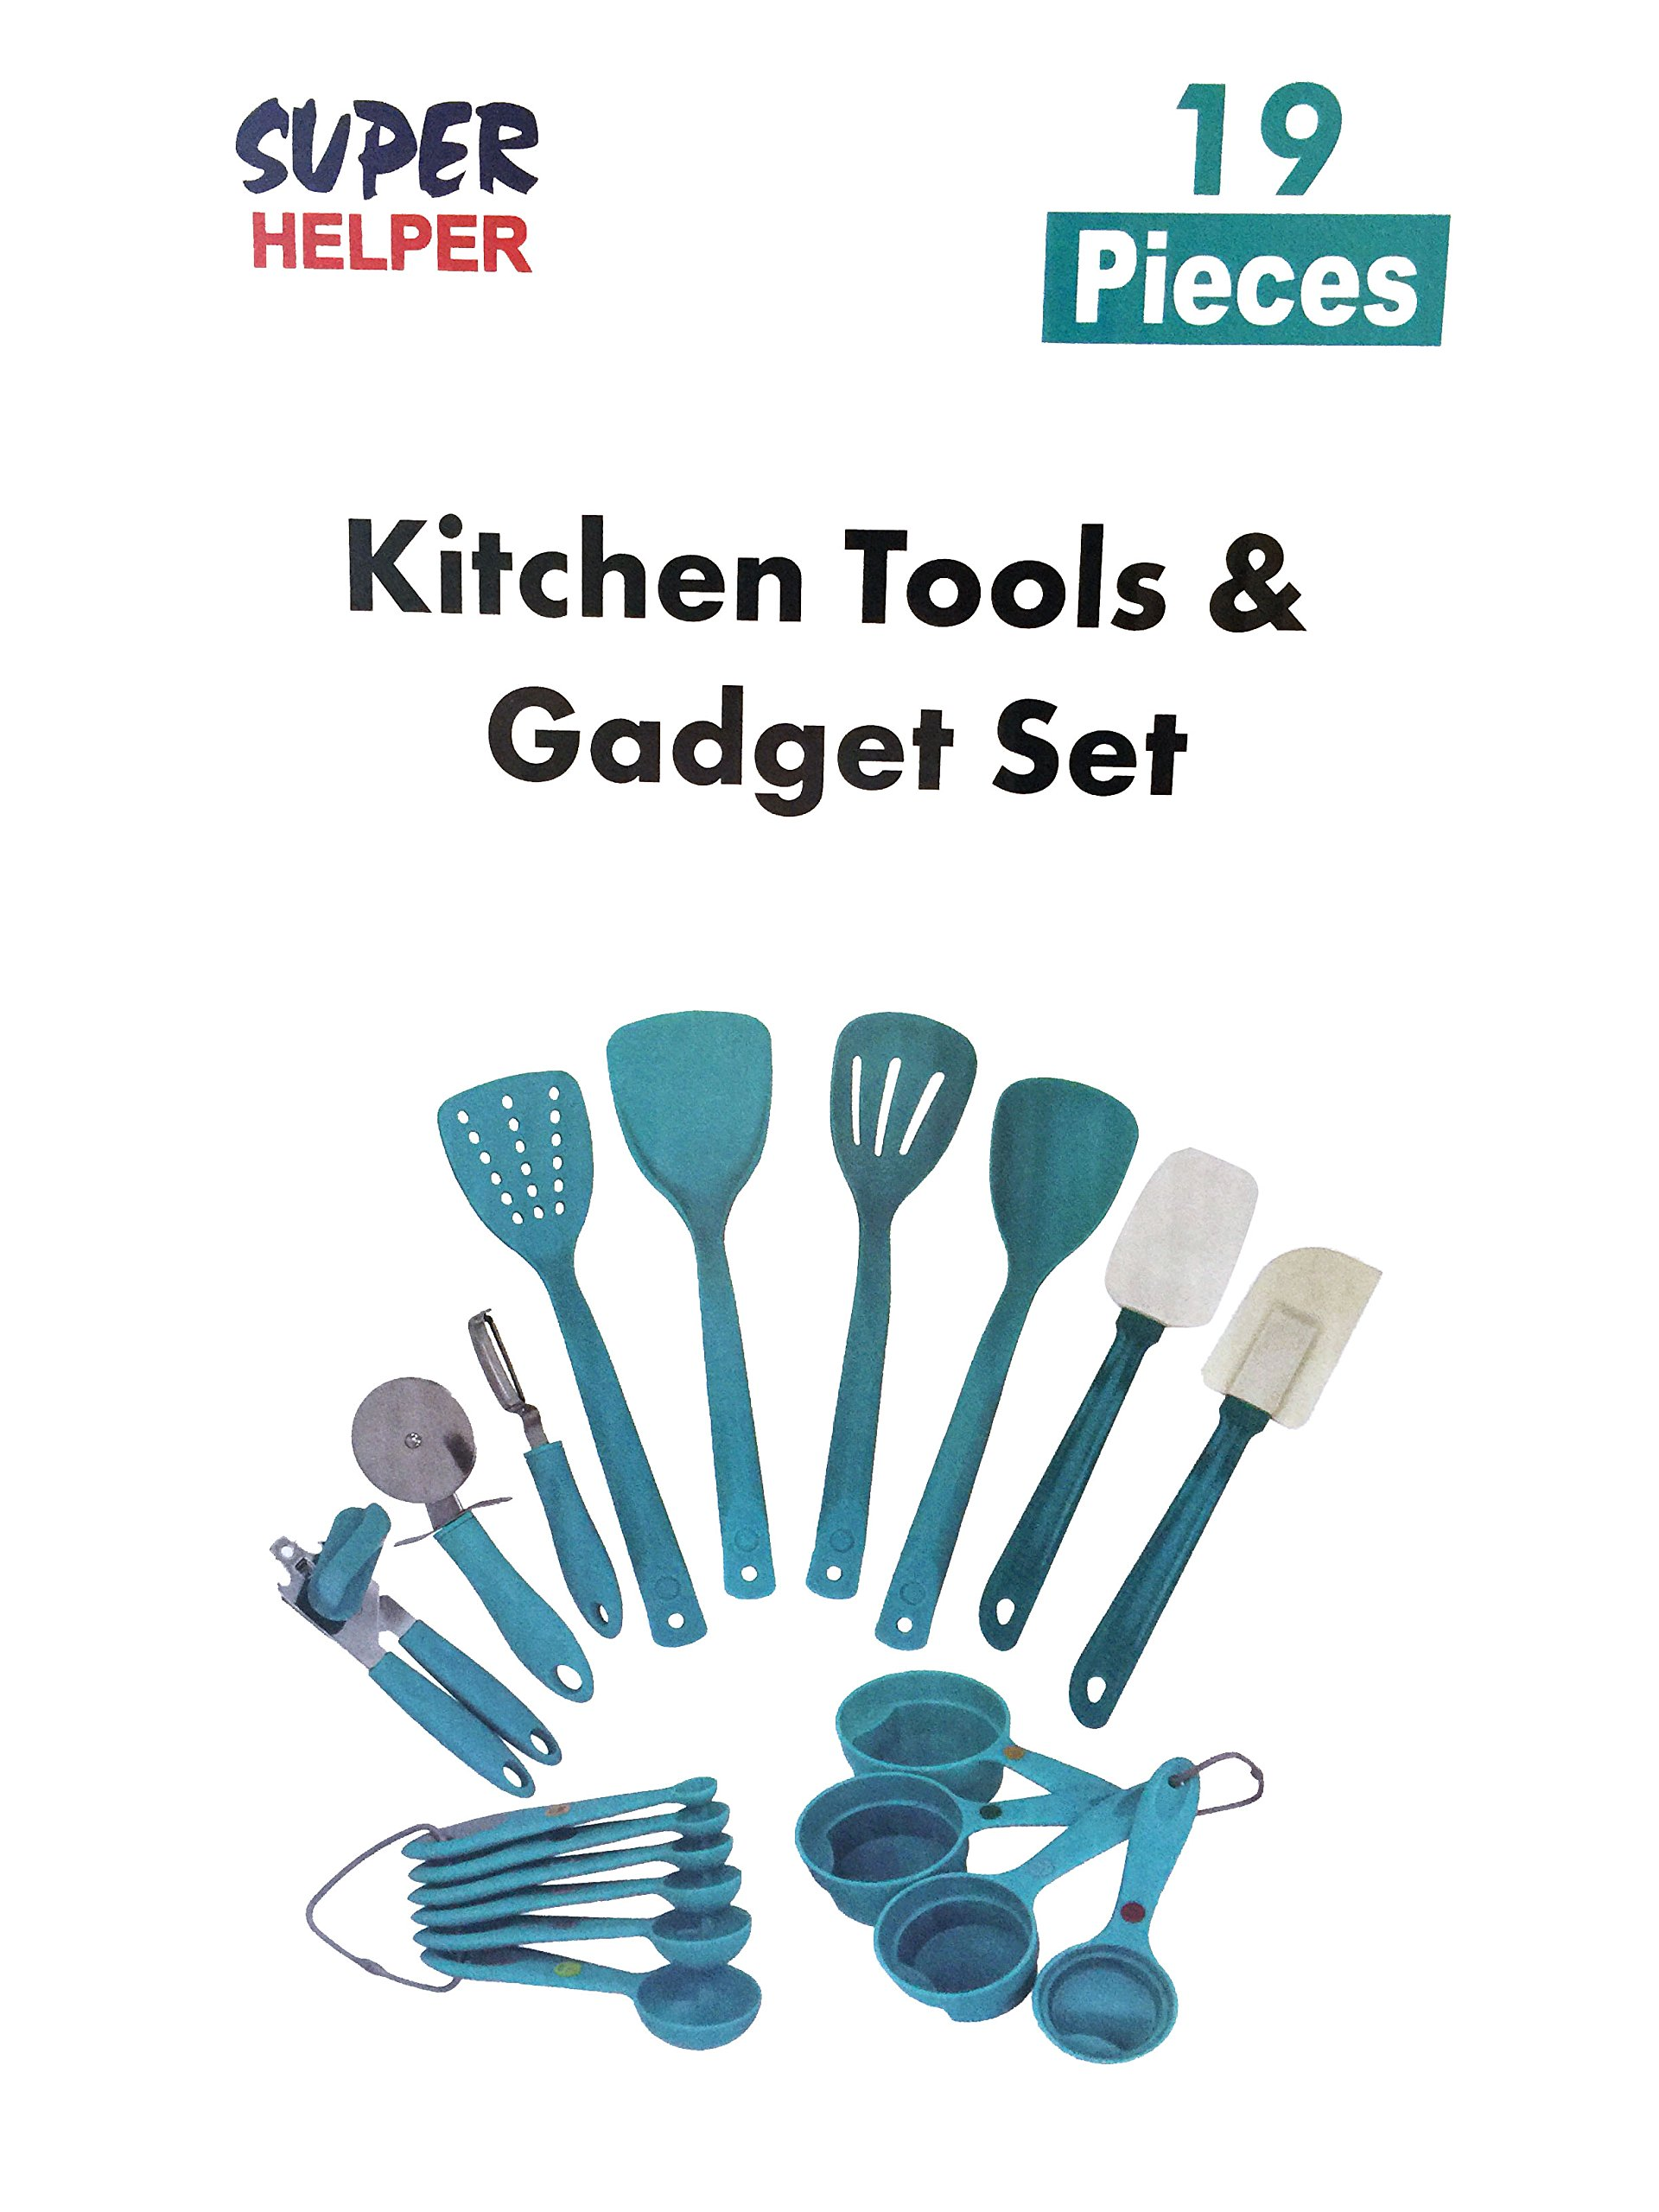 Kitchen Tools & Gadget Set-19 Pieces